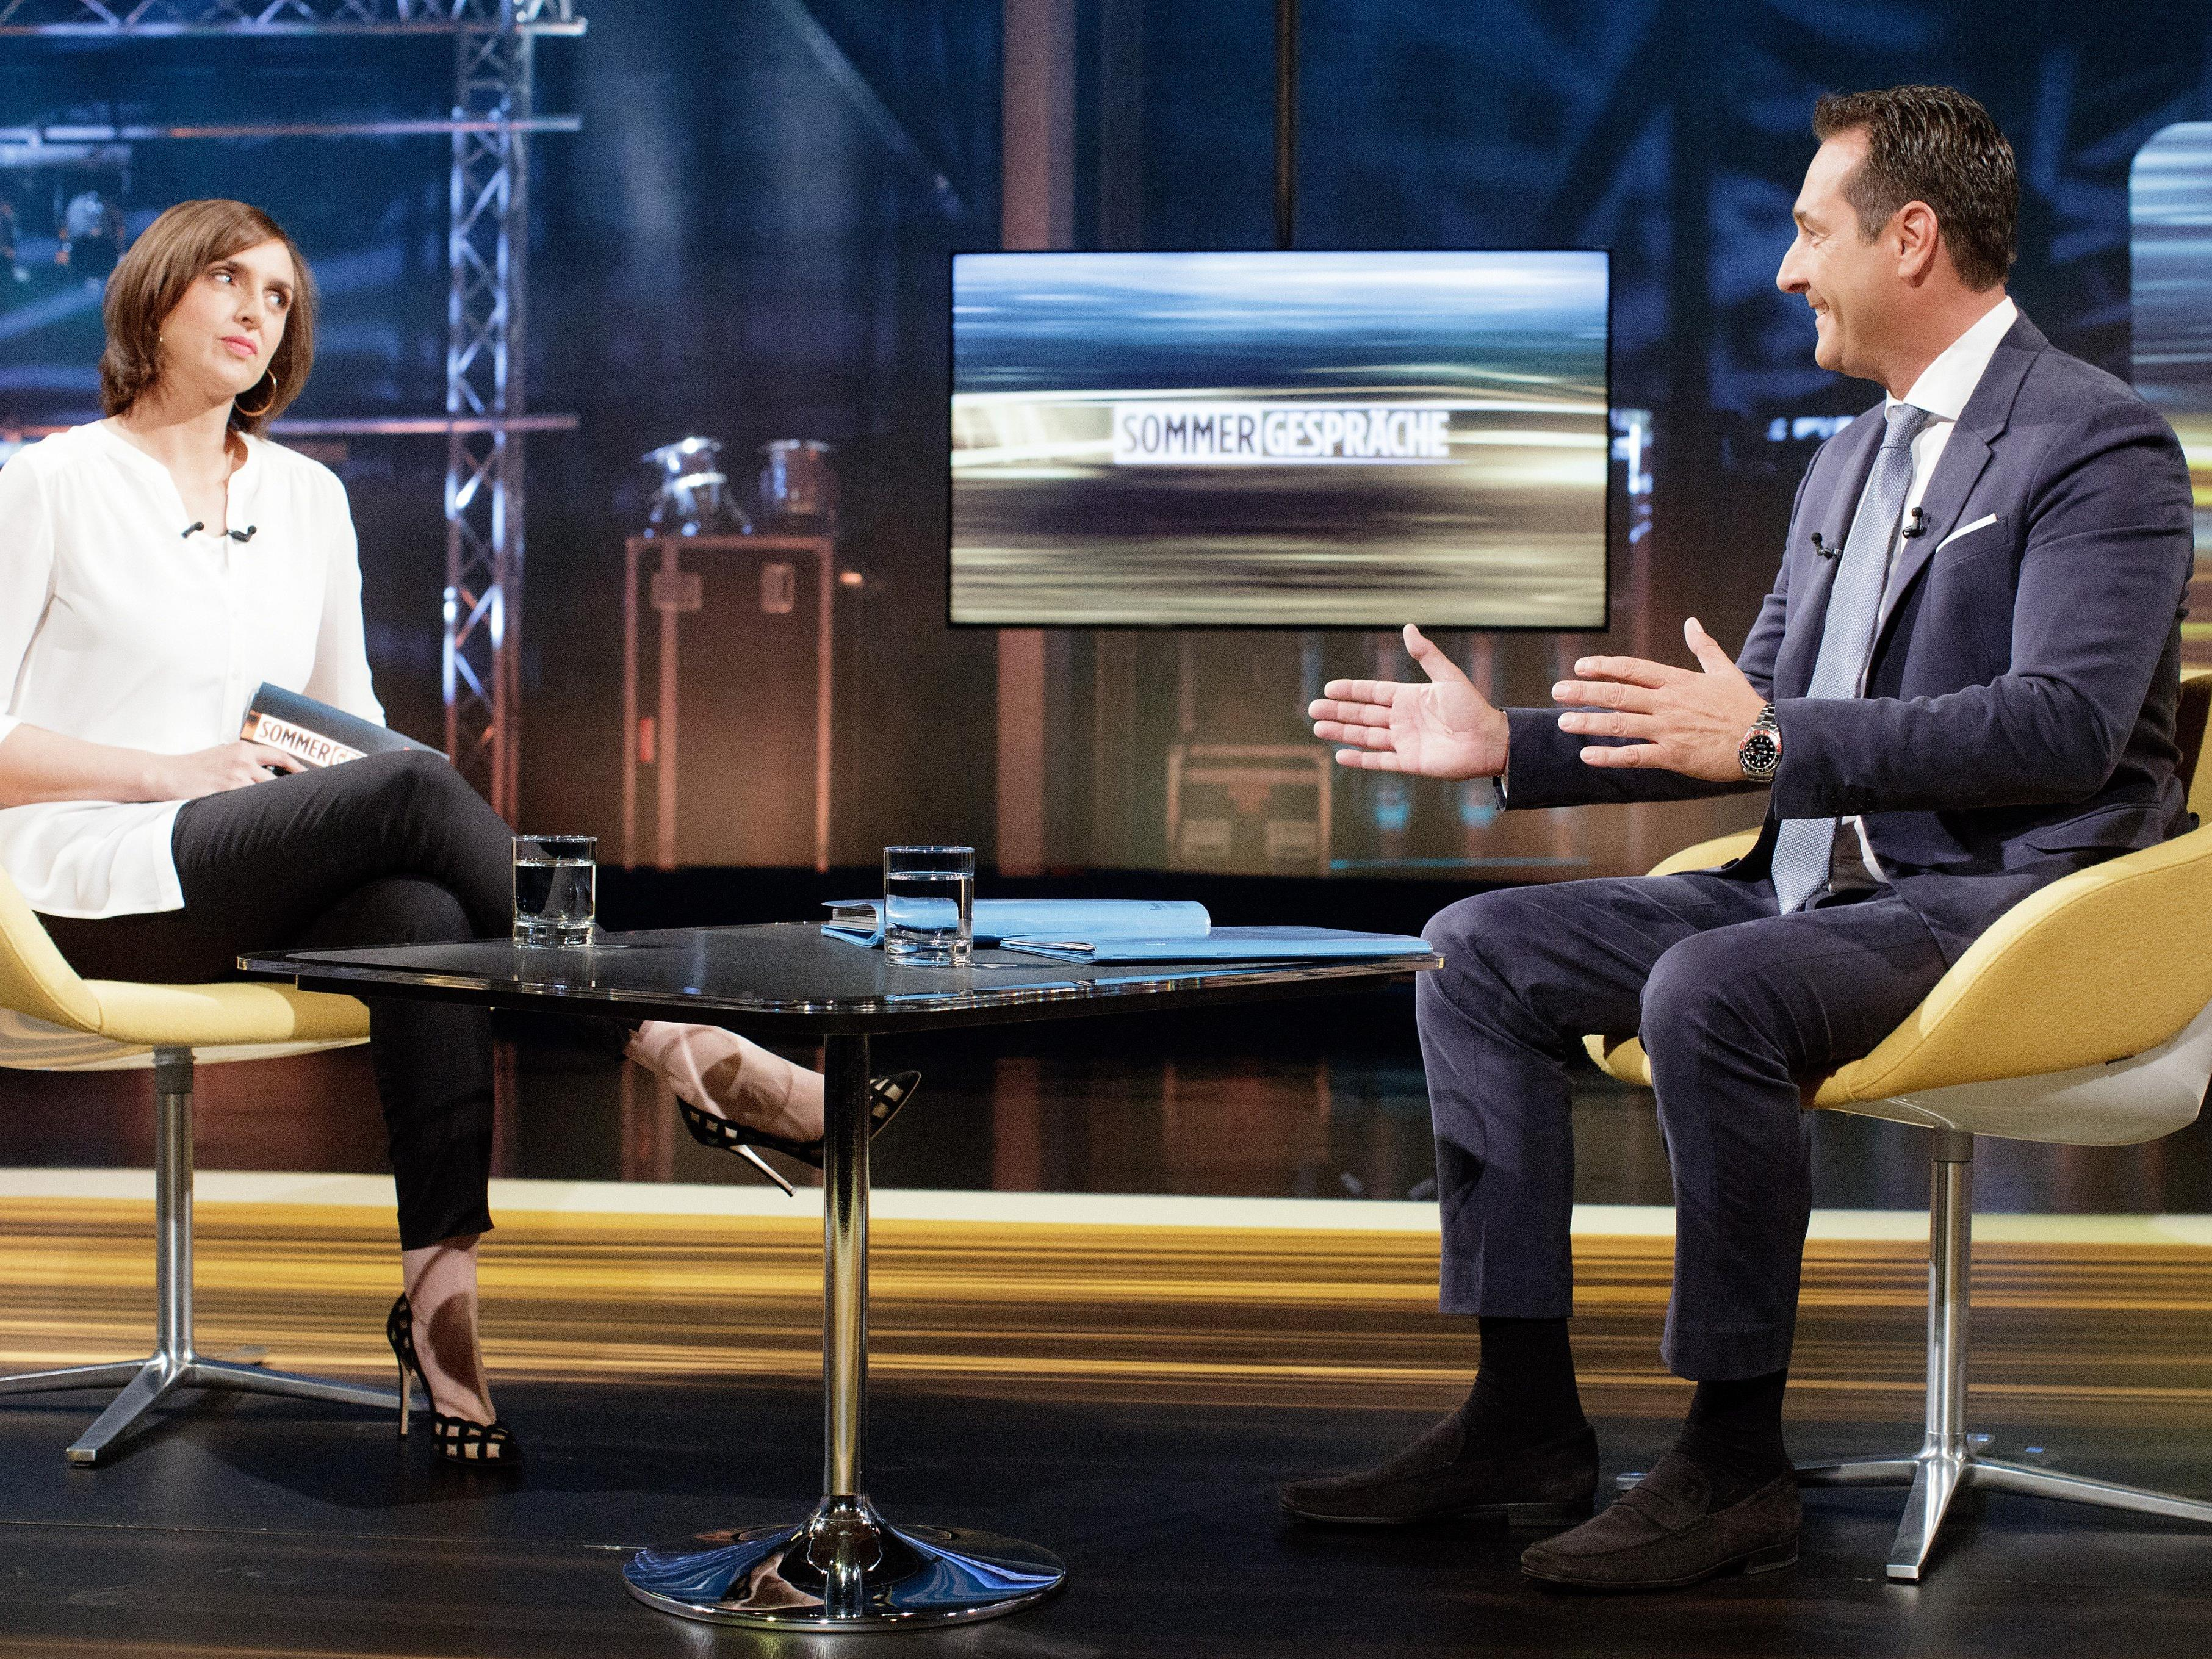 FPÖ-Chef Strache bem ORF-Sommergespräch